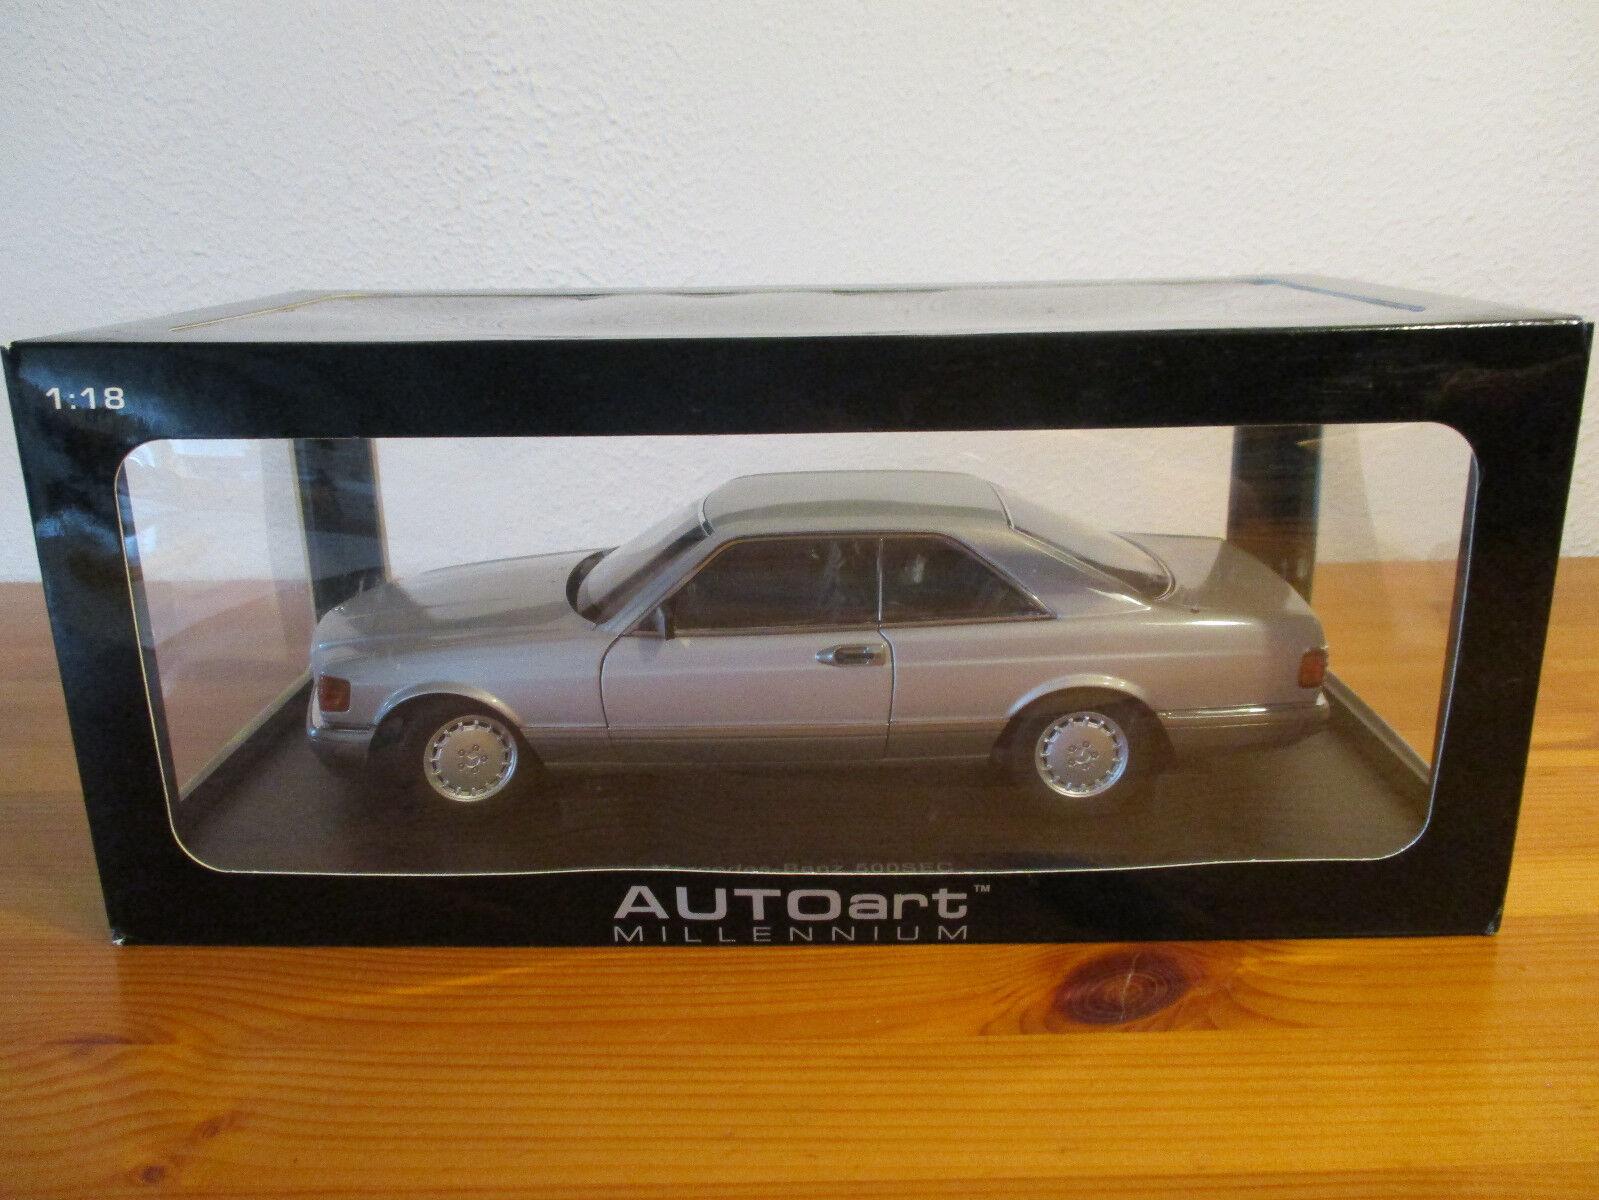 ( Gor ) 1 18 Autoart Mercedes Benz 500 Sec Coupé 1986 Argent Neuf Emballage